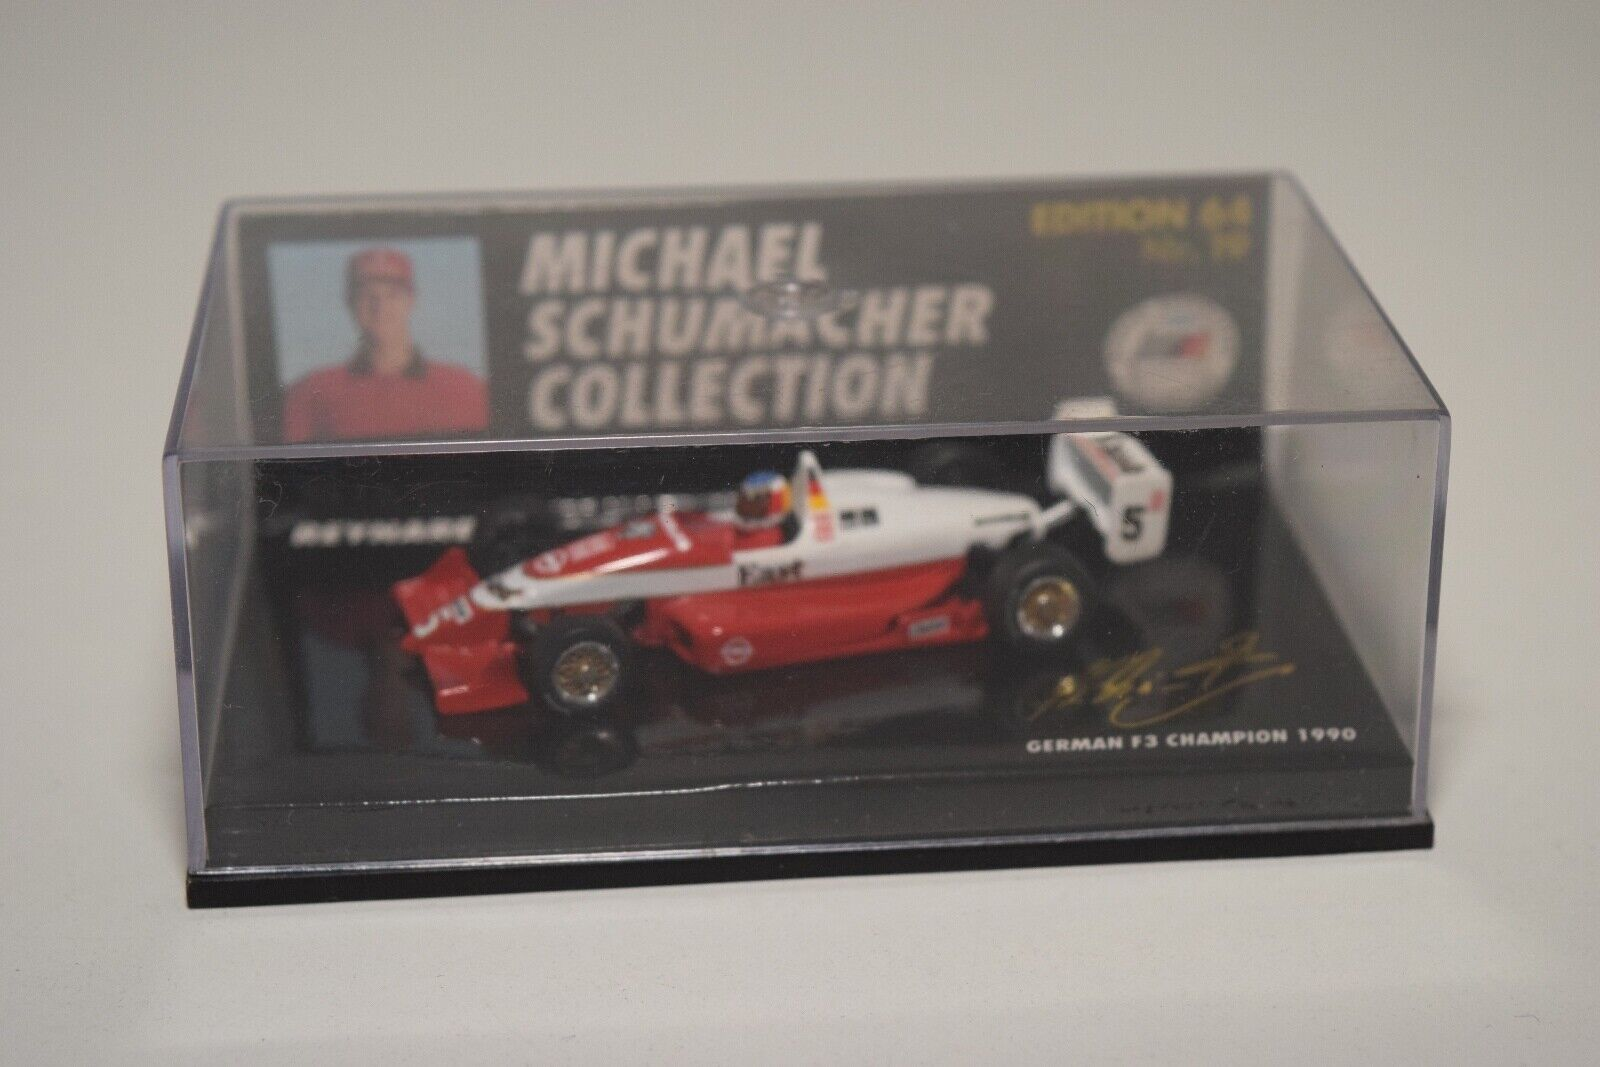 buena calidad V 1 64 MINICHAMPS SCHUMACHER REYNARD F3 GERMAN GERMAN GERMAN CHAMPION 1990 F1 FORMULA 1 MIB  el mejor servicio post-venta